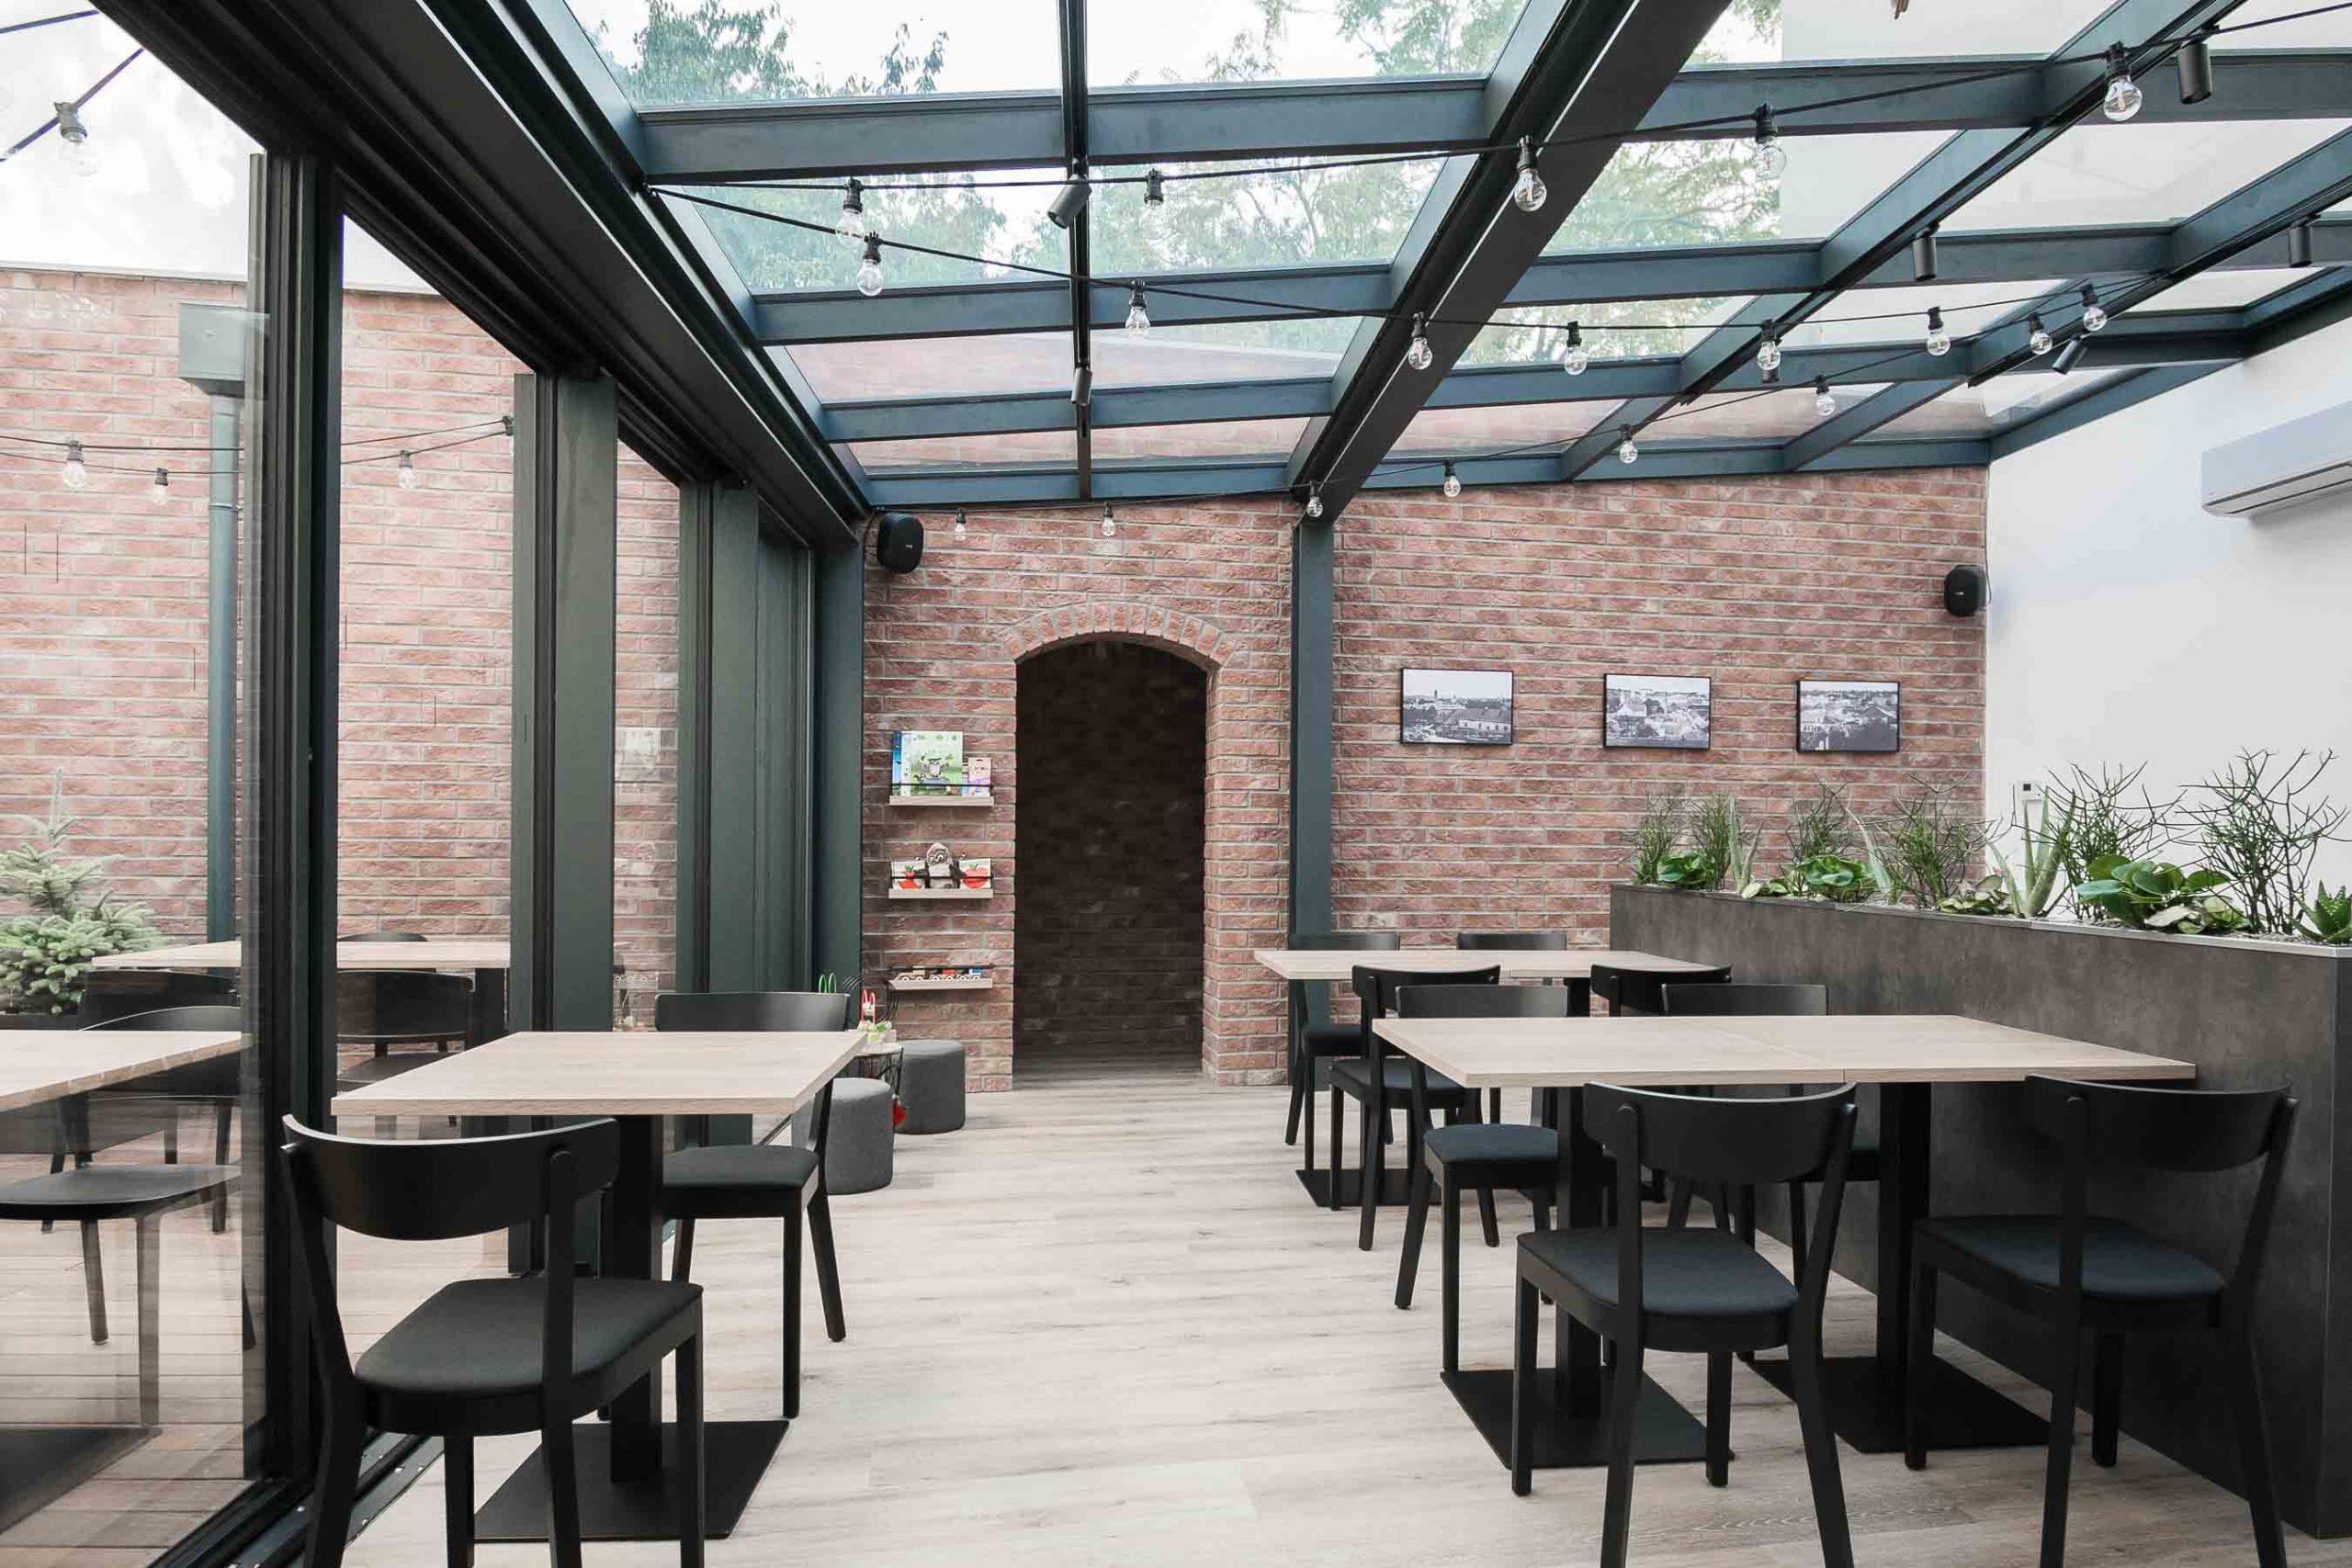 Rekonstrukcia a pristavba kaviarne, terasa nova, VAUarchitects